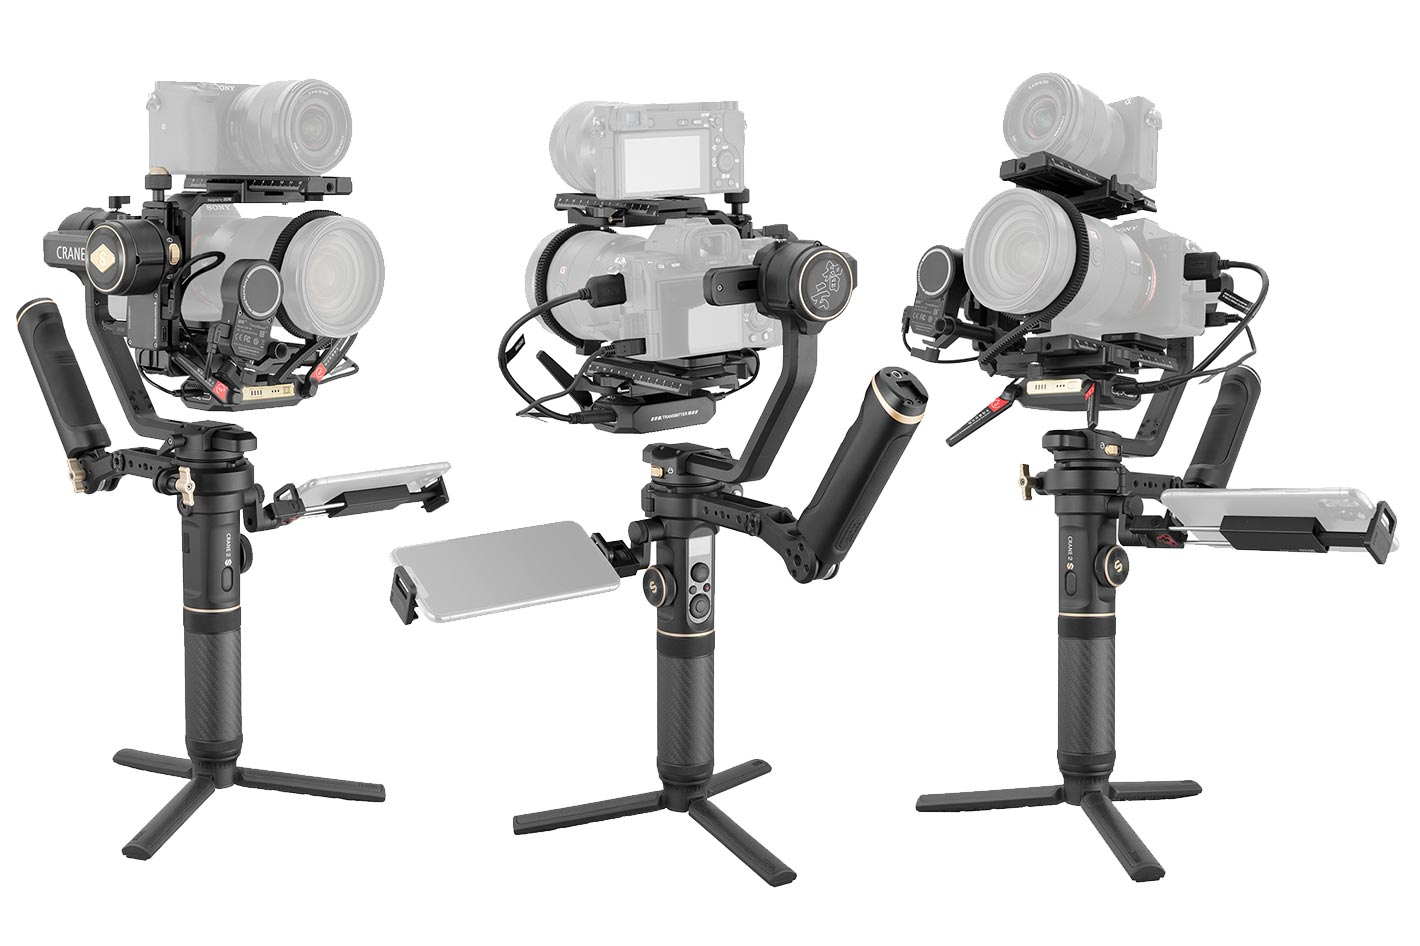 Zhiyun Crane 2S Pro, a new three-axis handheld gimbal